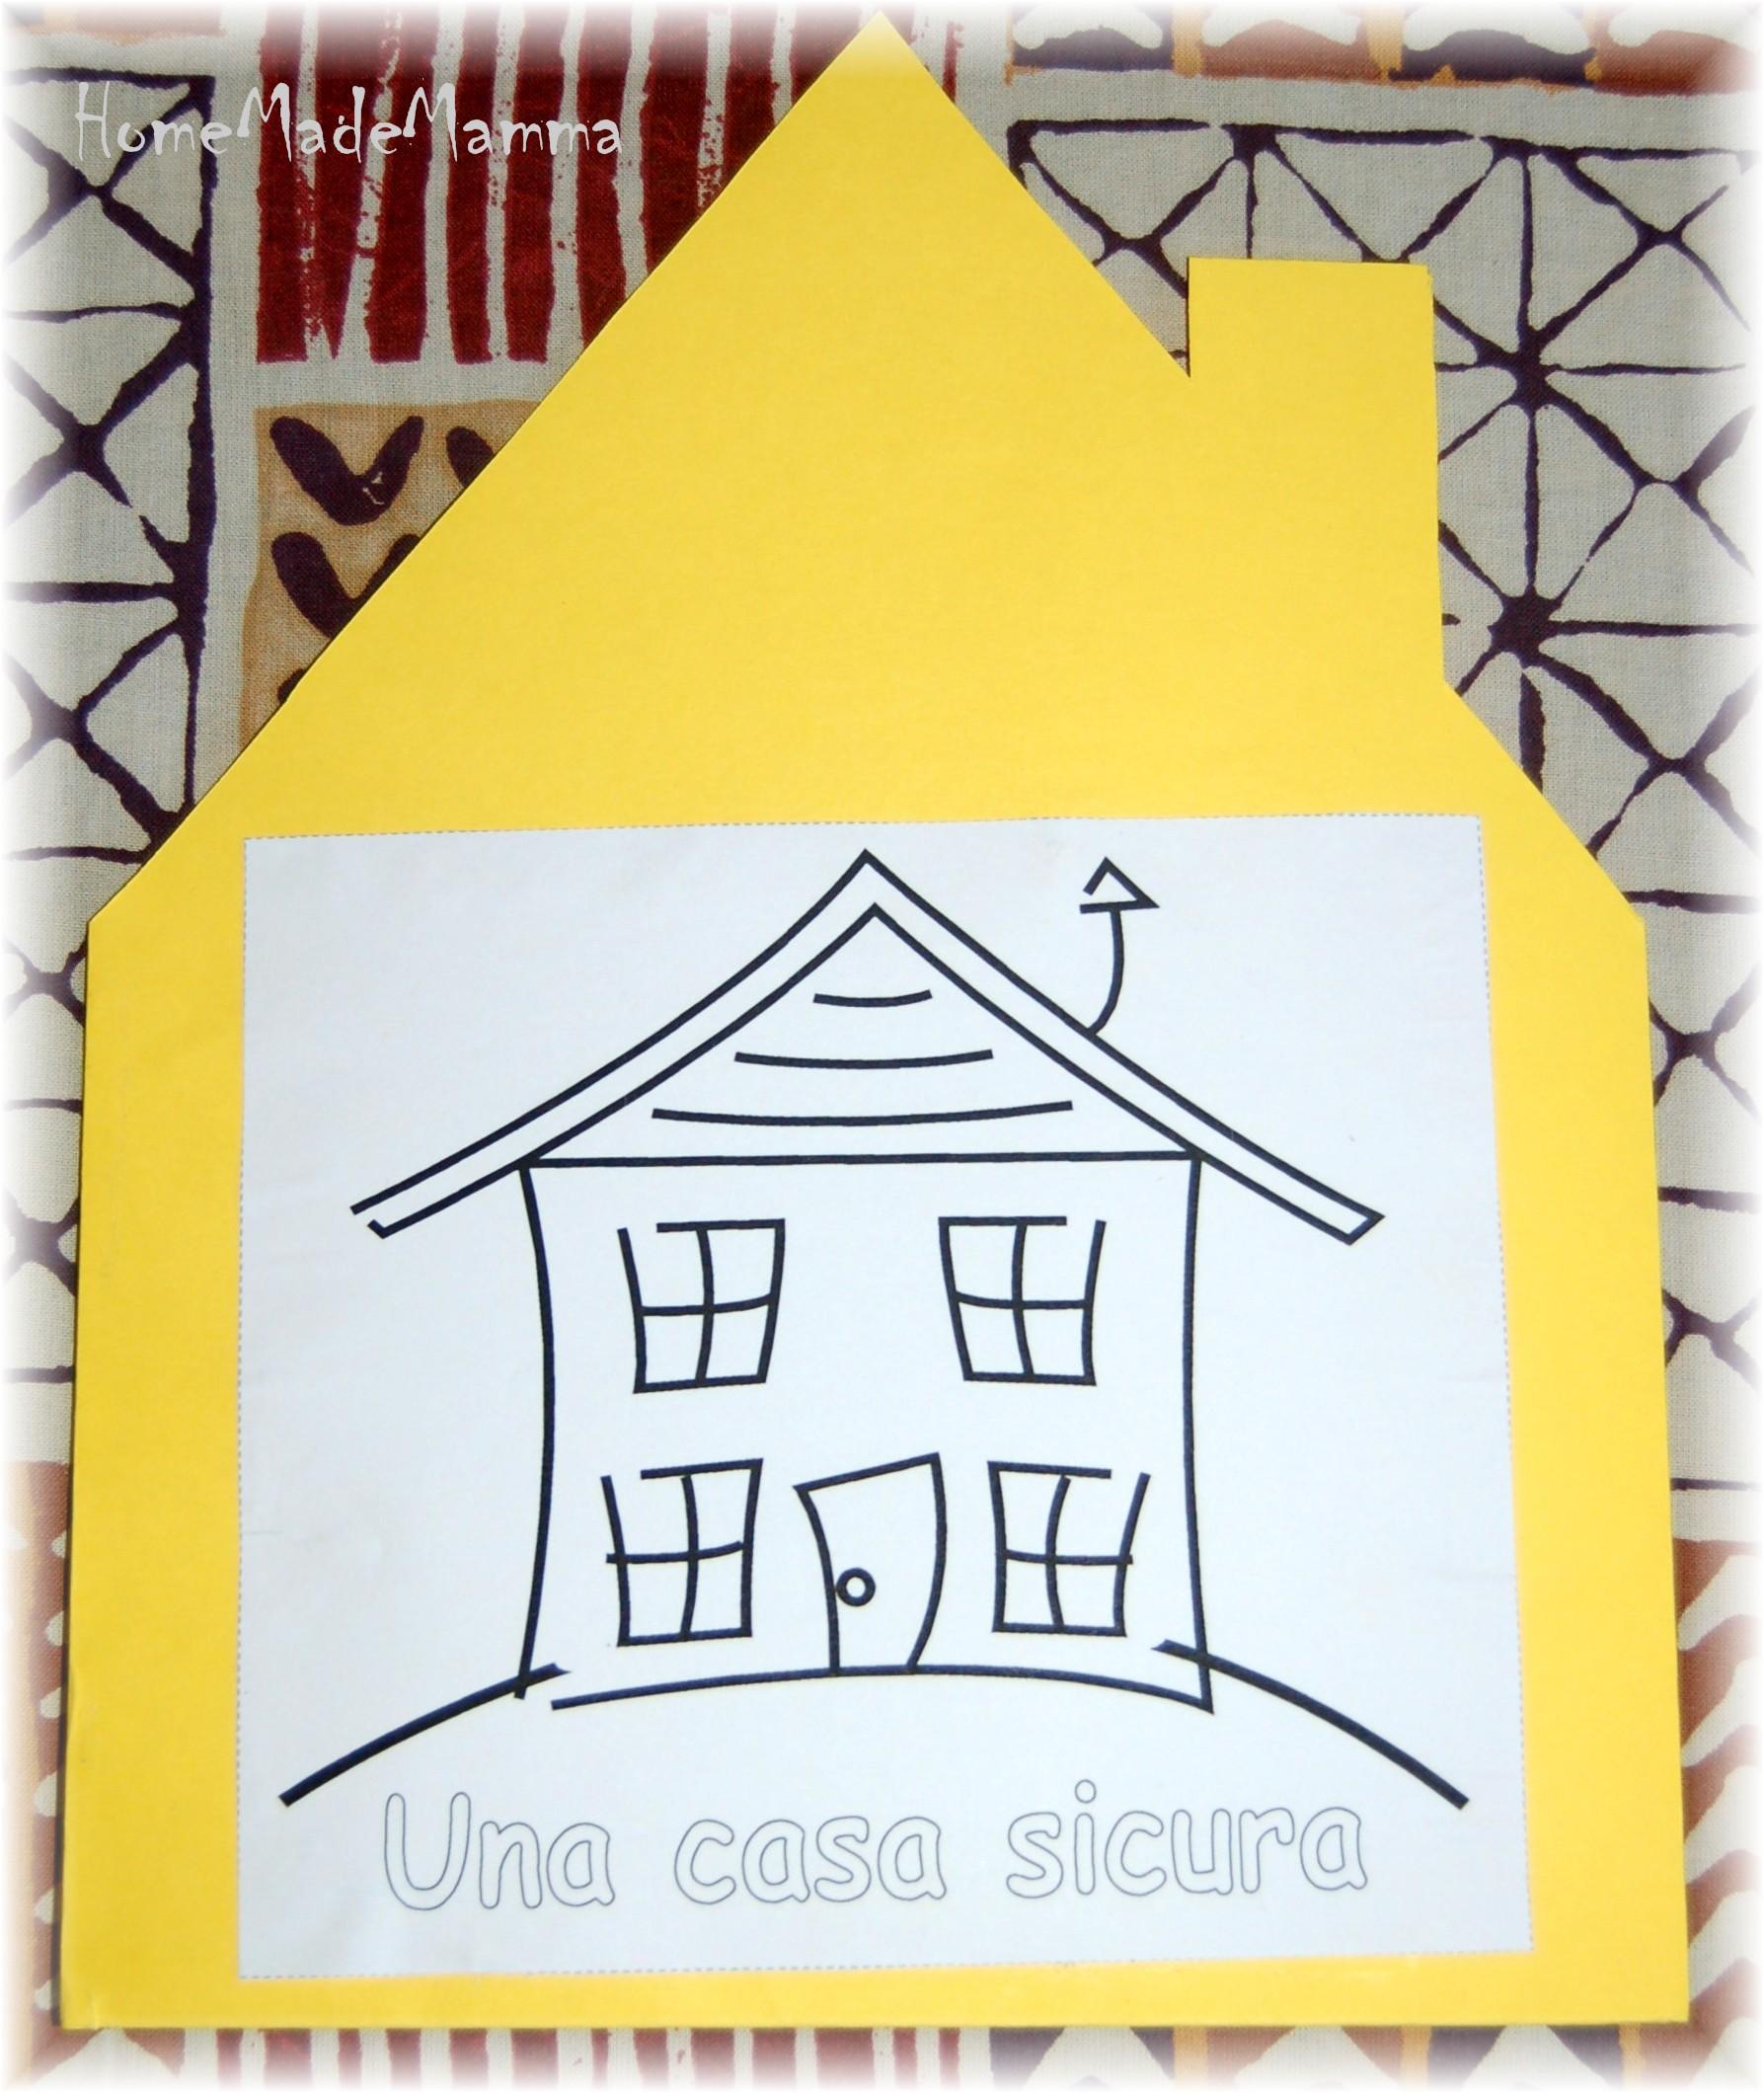 Libri fai da te schede part 15 - Libri di scuola materna stampabili gratuitamente ...